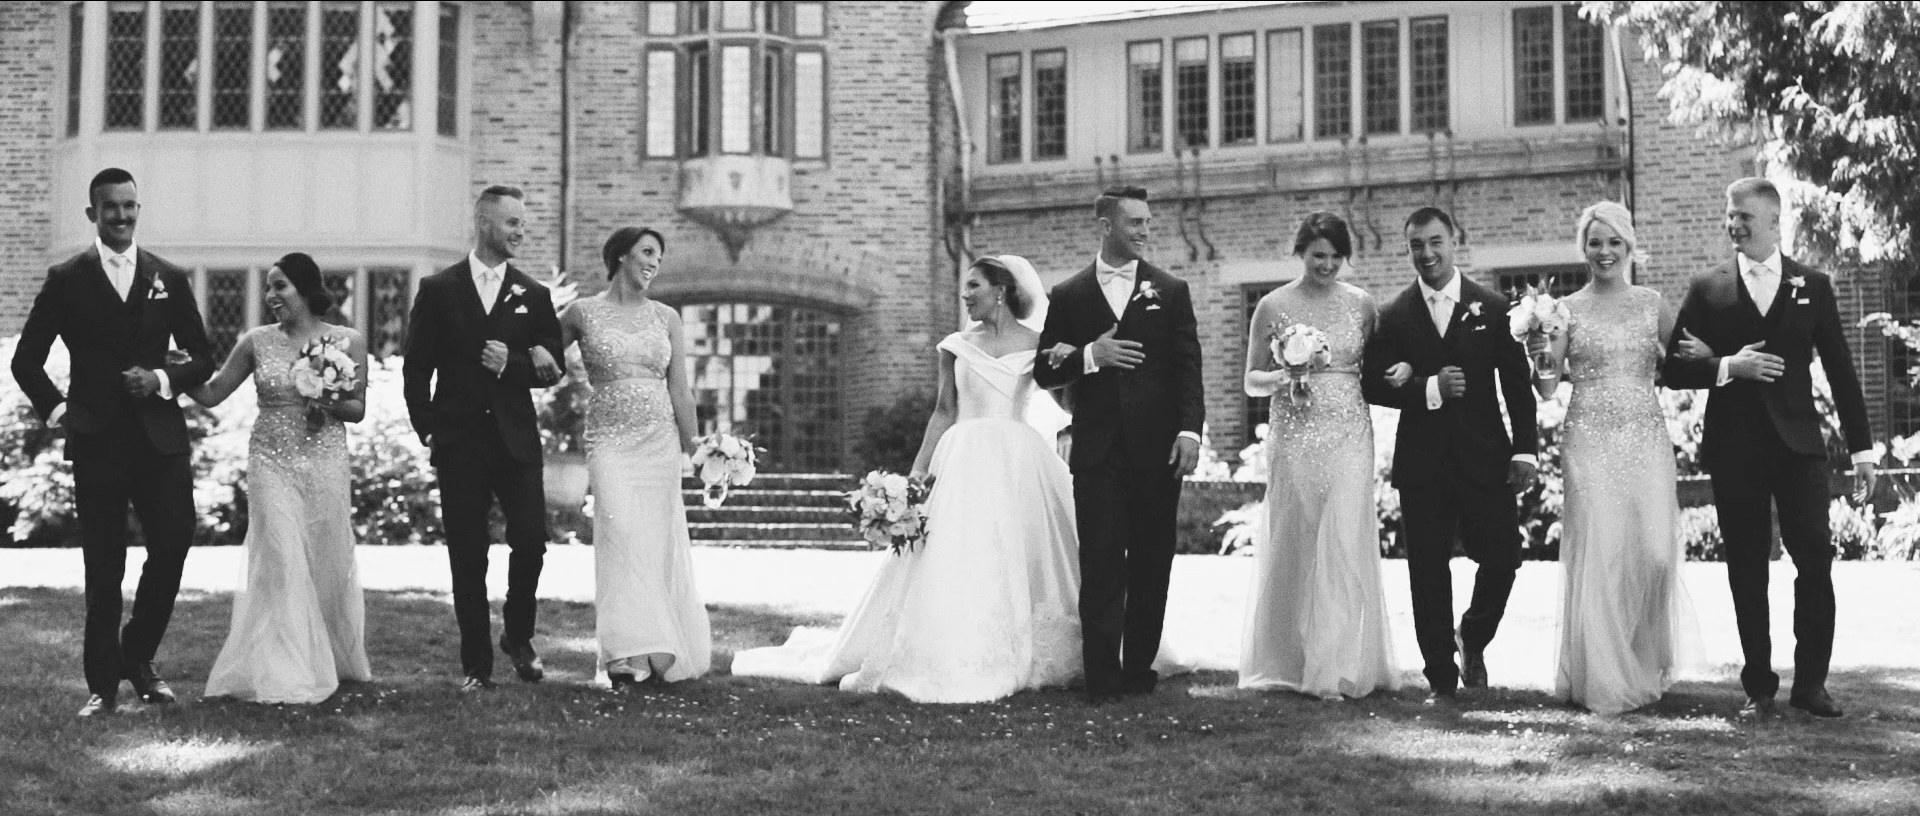 Lewis+Clark+College+Wedding+Videographer+Photographer_010.png